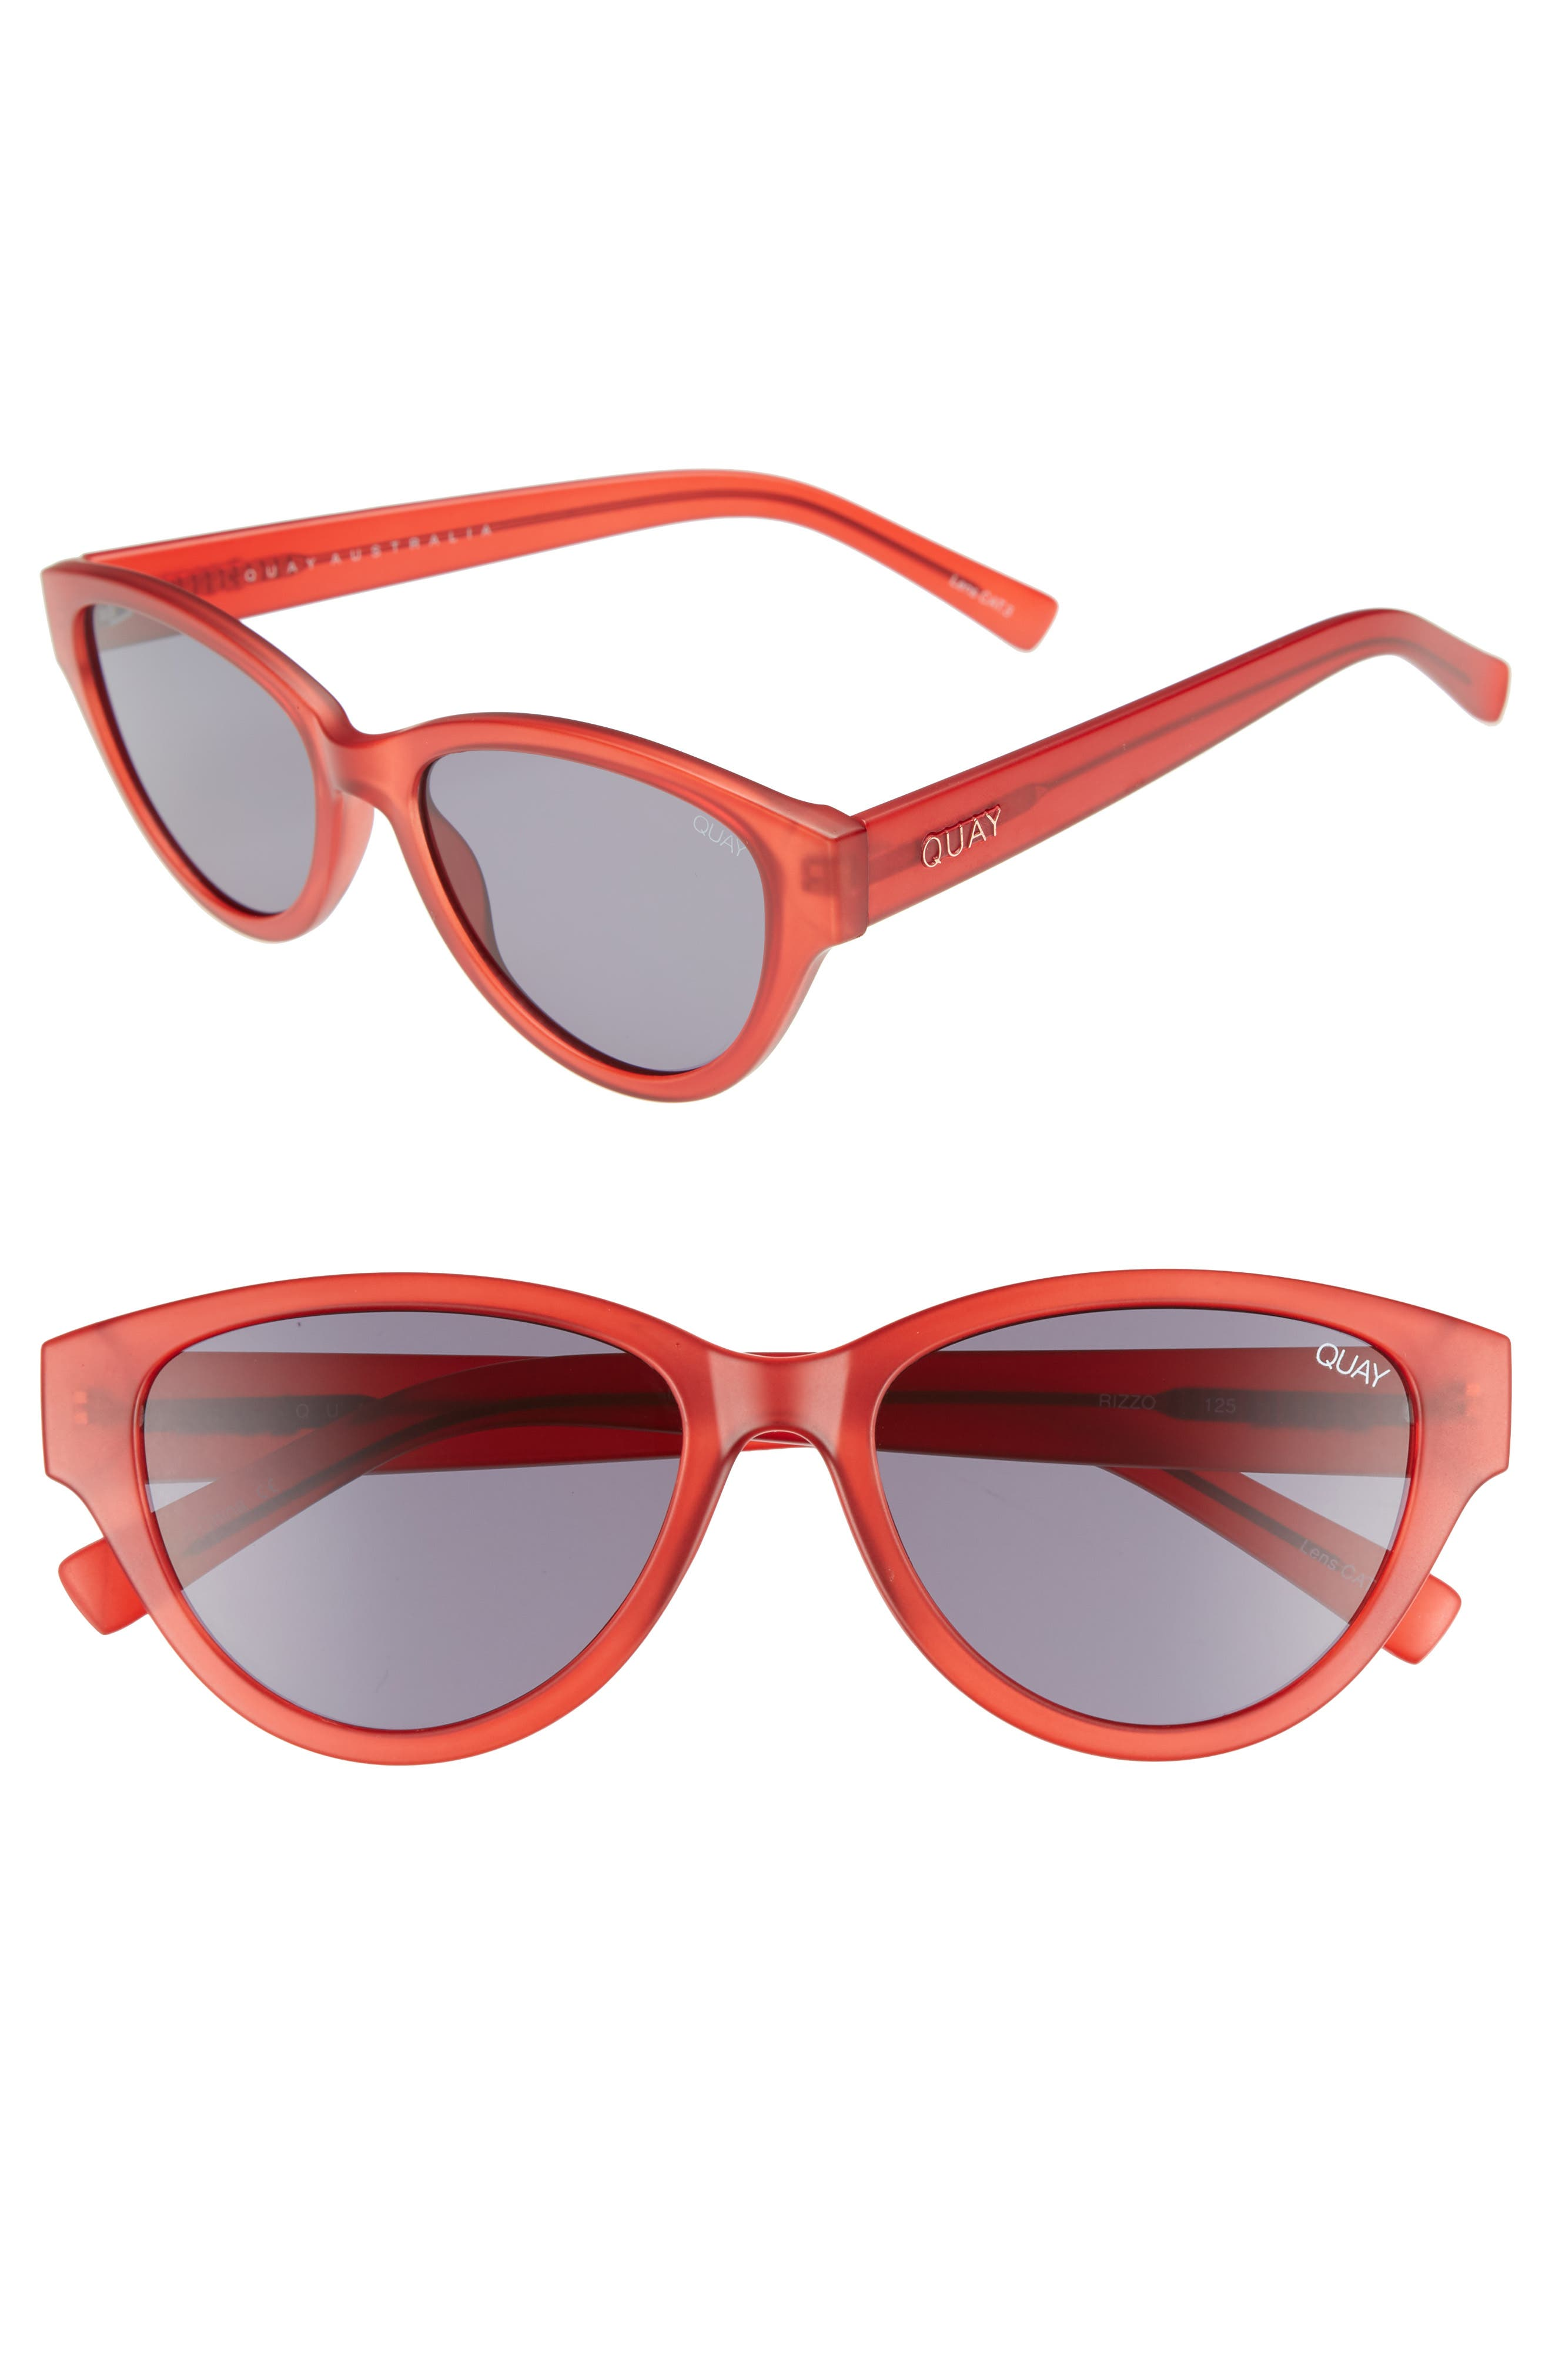 Rizzo 55mm Cat Eye Sunglasses,                         Main,                         color, RED/ SMOKE